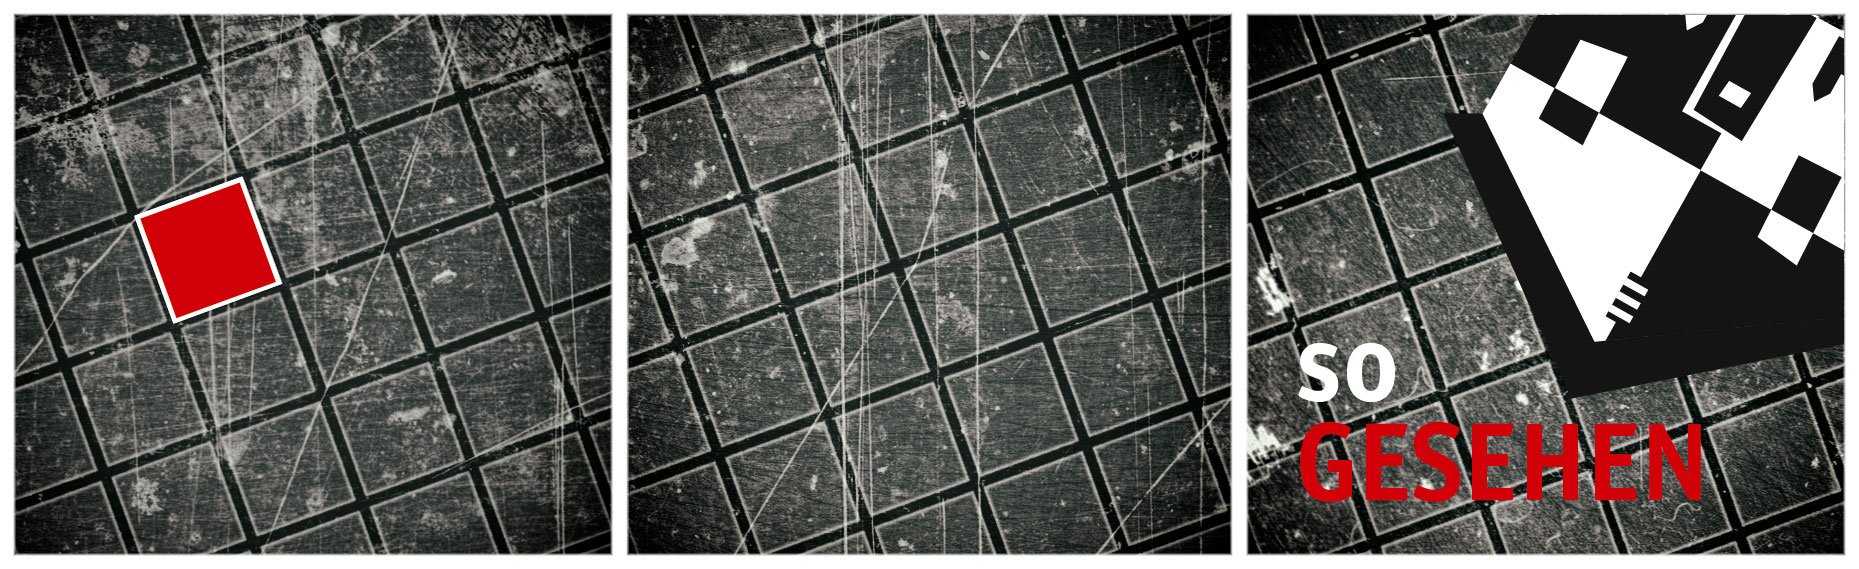 bg galerie pixels sogesehen